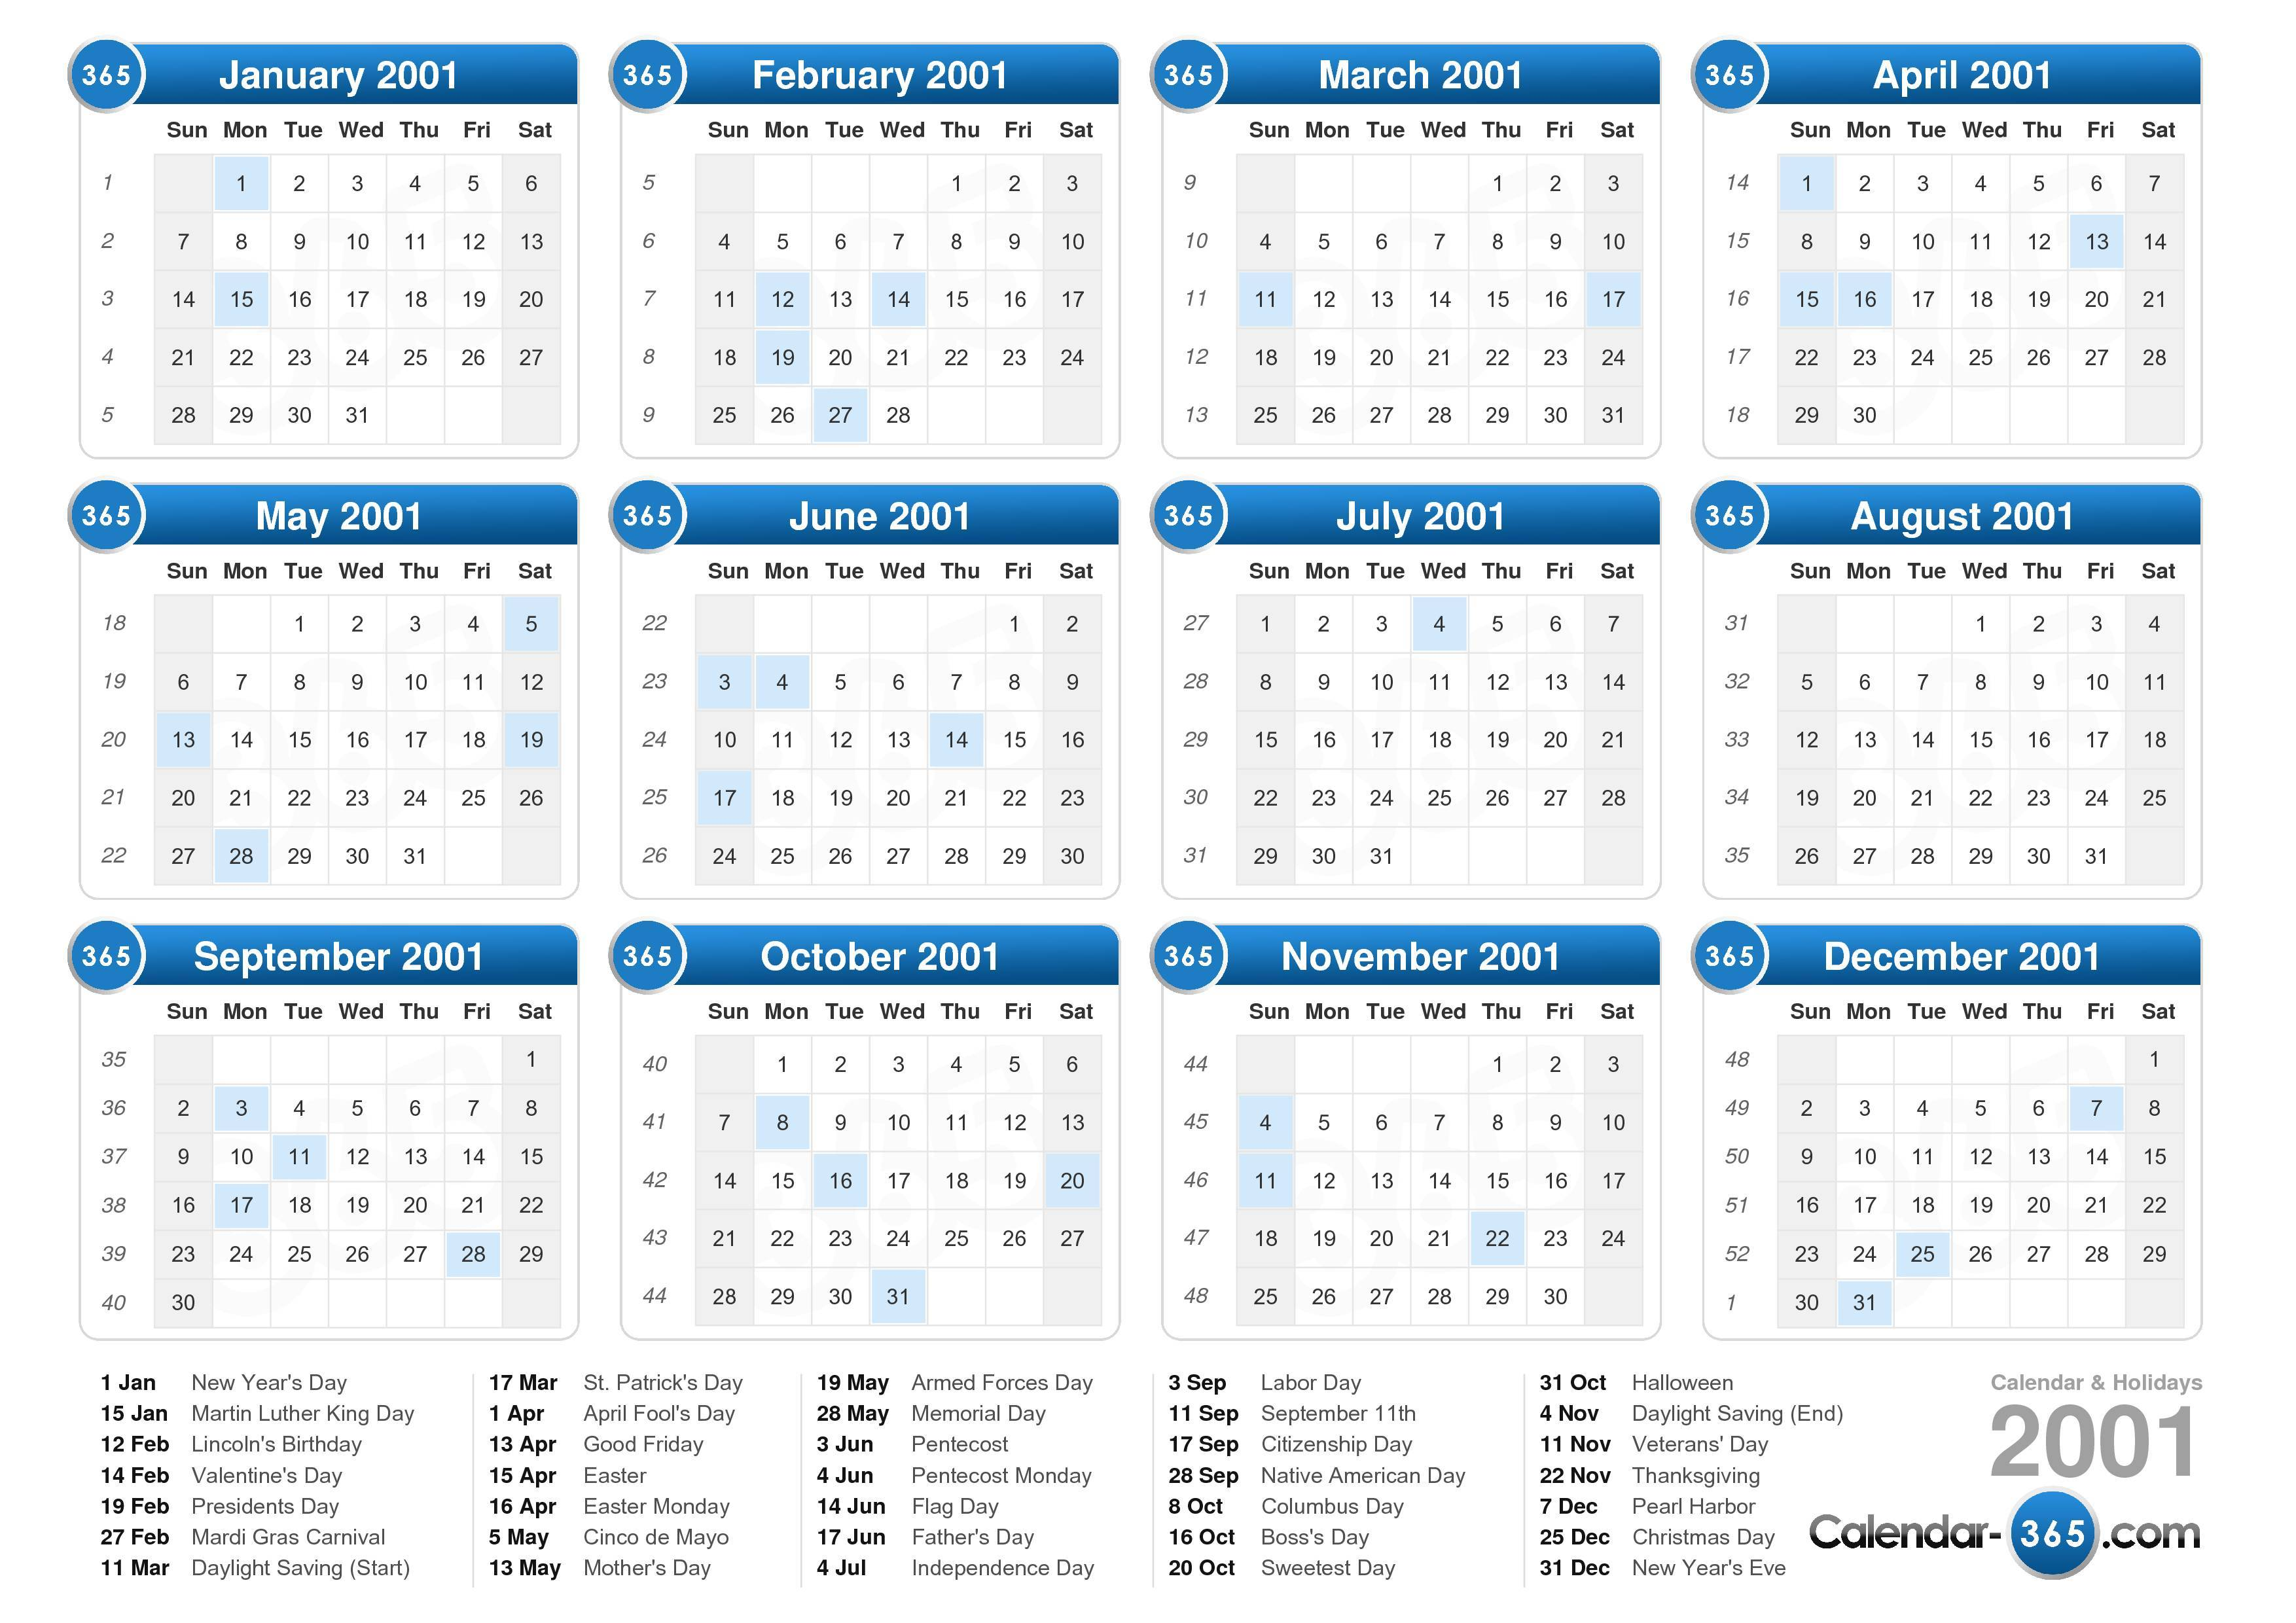 ... calendar with holidays landscape format 1 page 2001 calendar 861 43